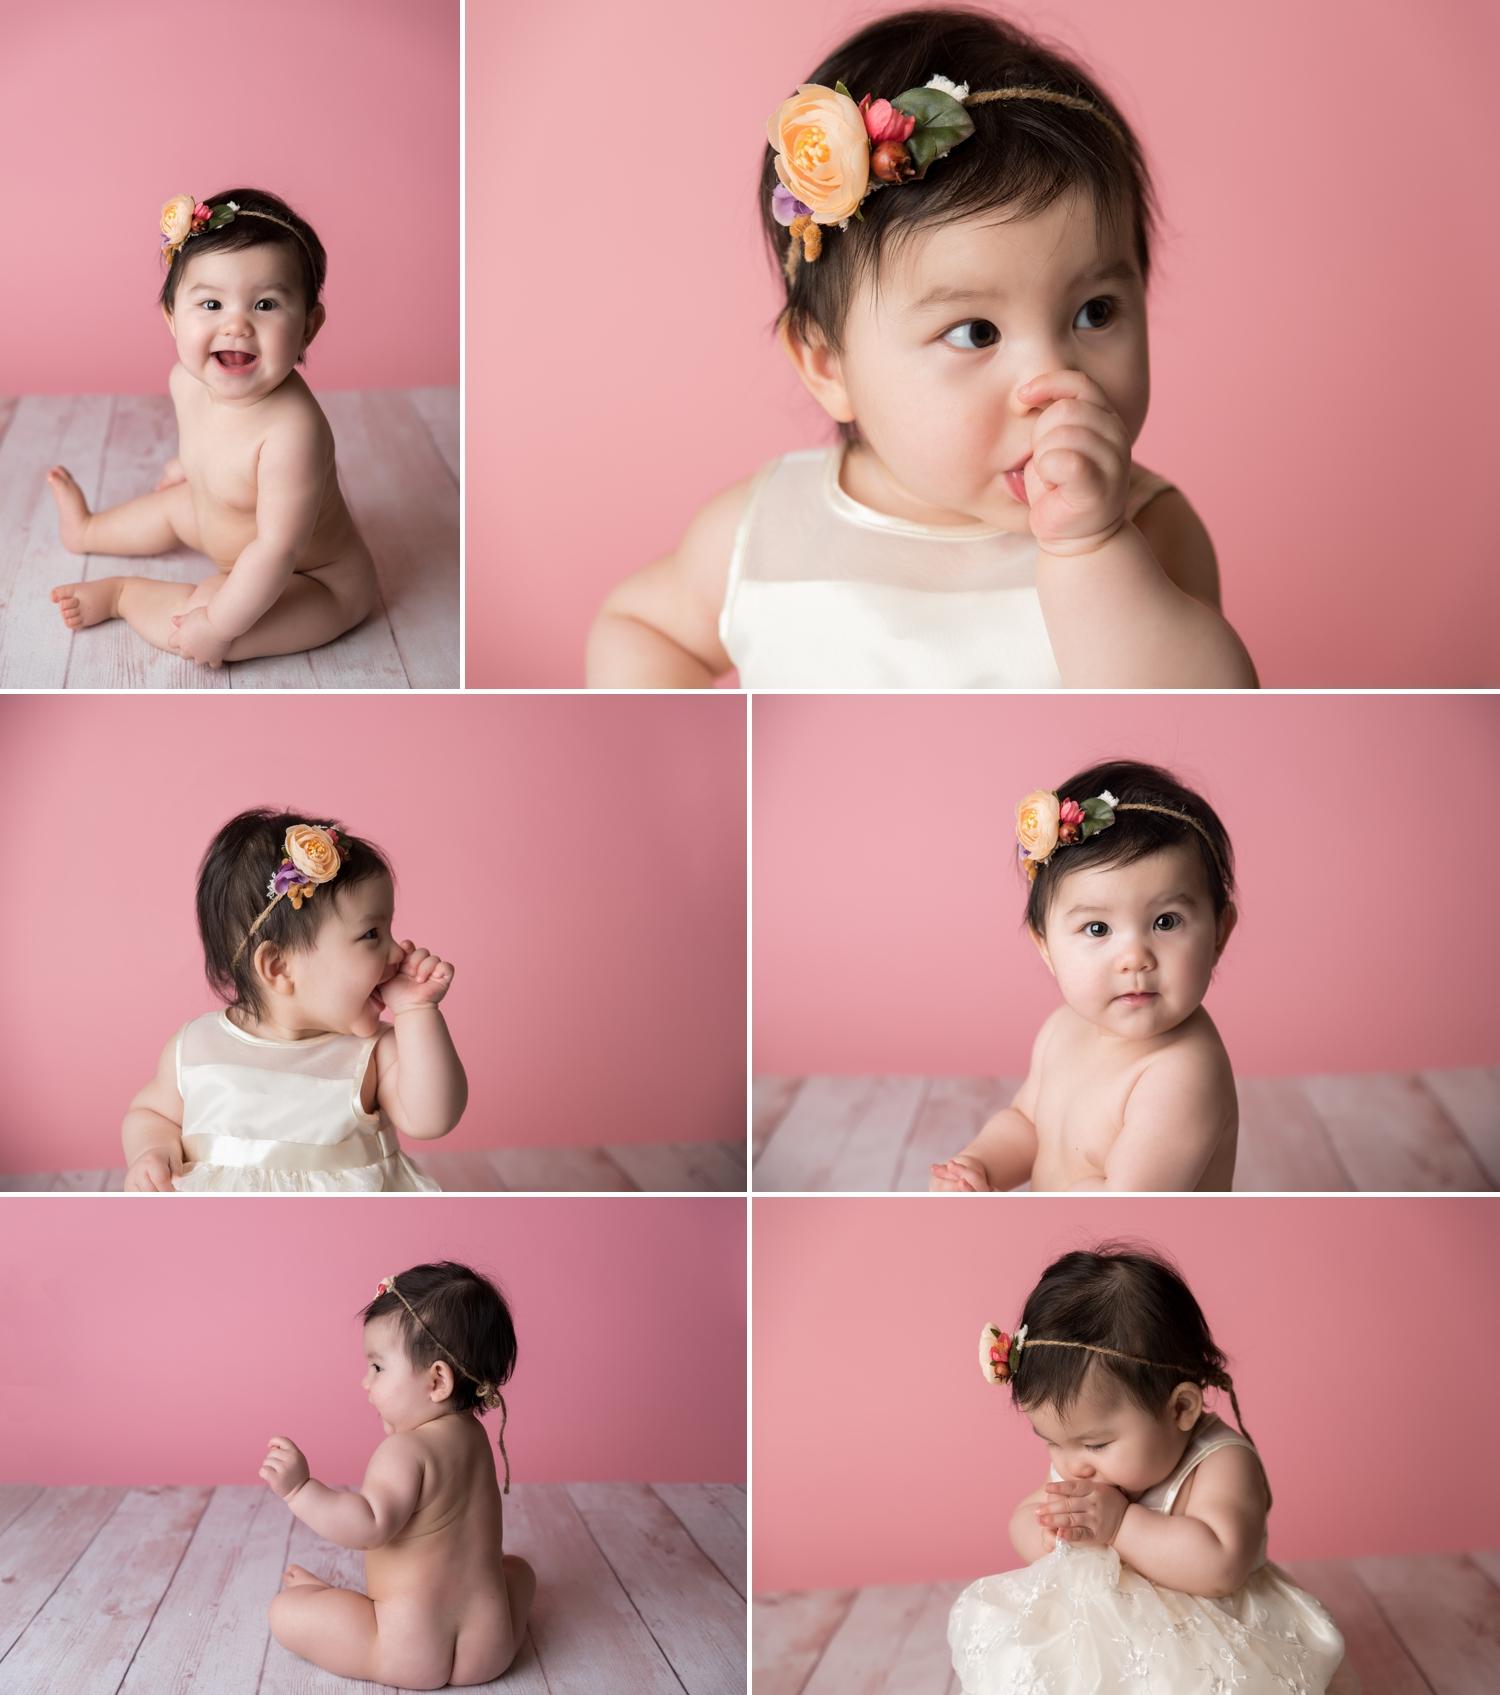 southwest-kansas-childrens-photography 2.jpg